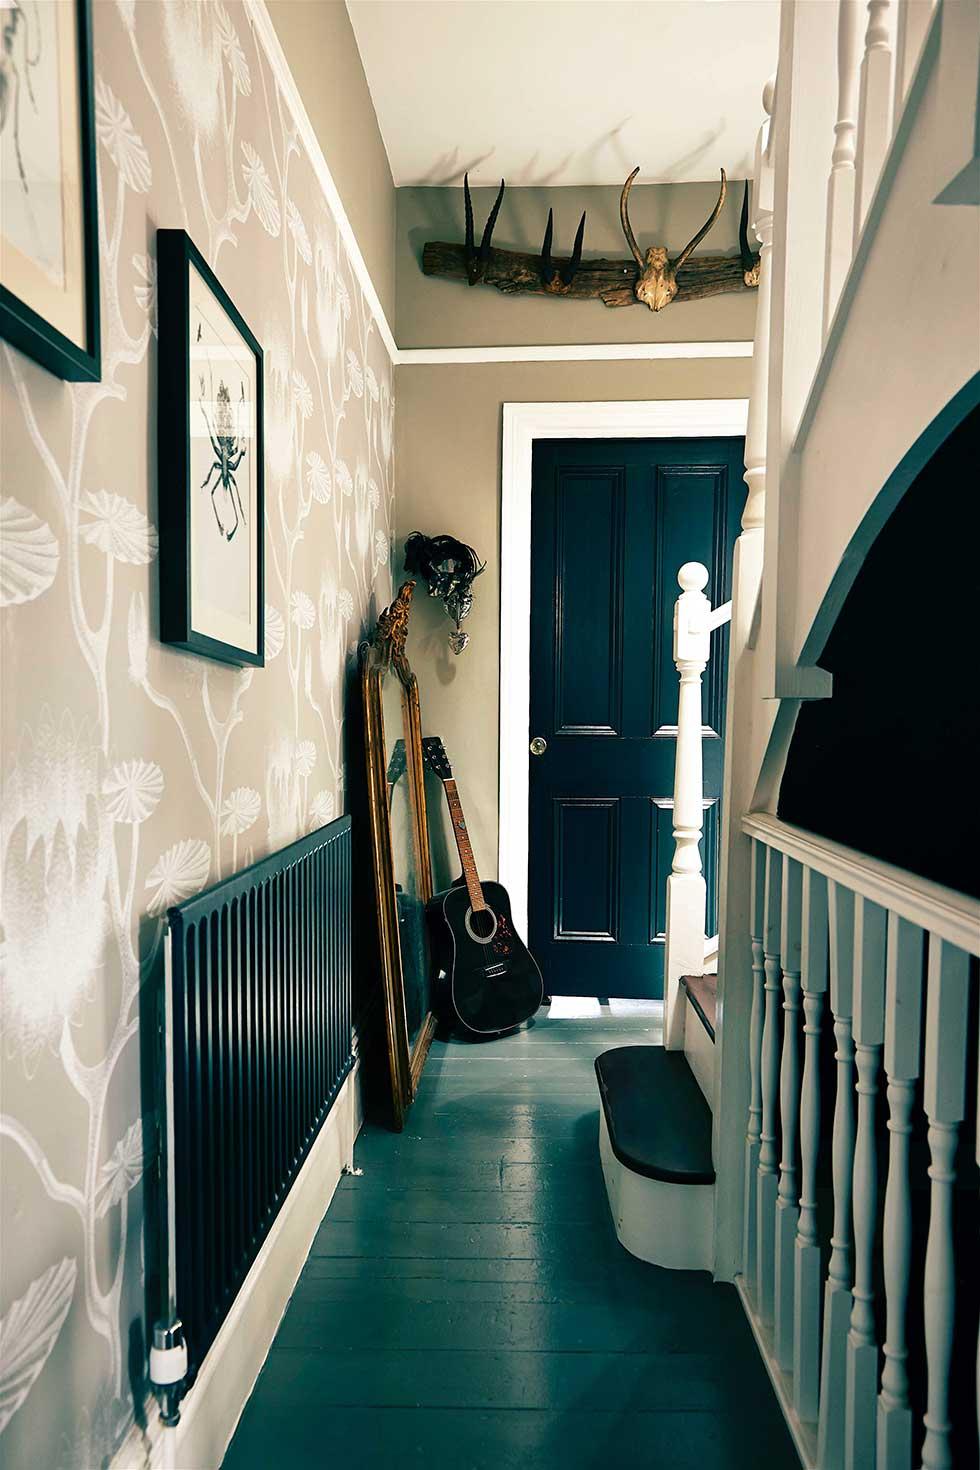 Duplex apartment floral wallpaper in hallway